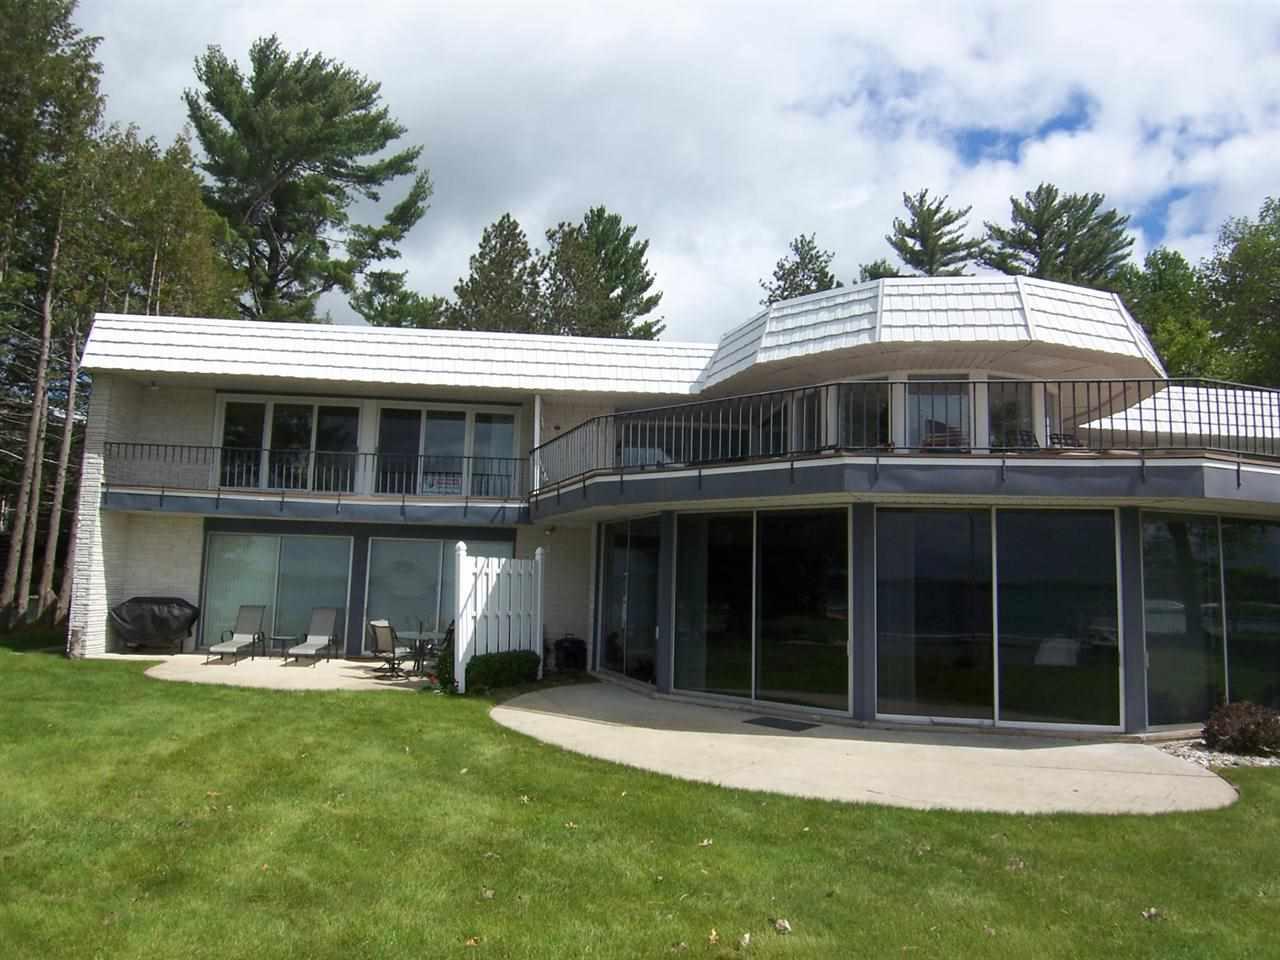 Real Estate for Sale, ListingId: 24676660, Roscommon,MI48653